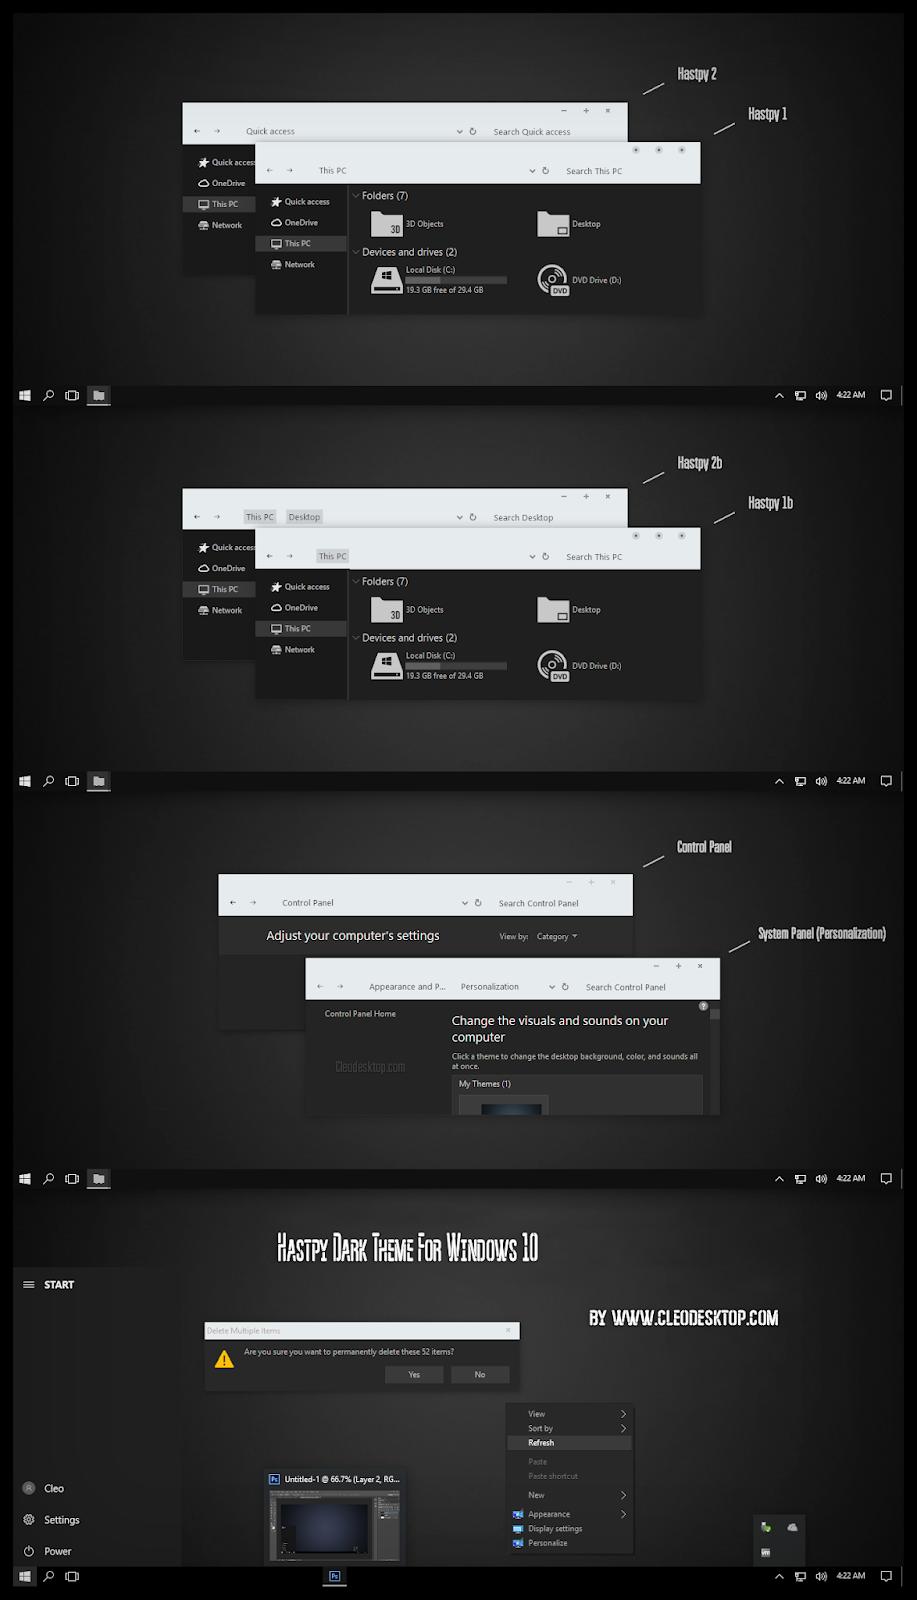 Hastpy Dark White Theme Windows10 November 2019 Update 1909